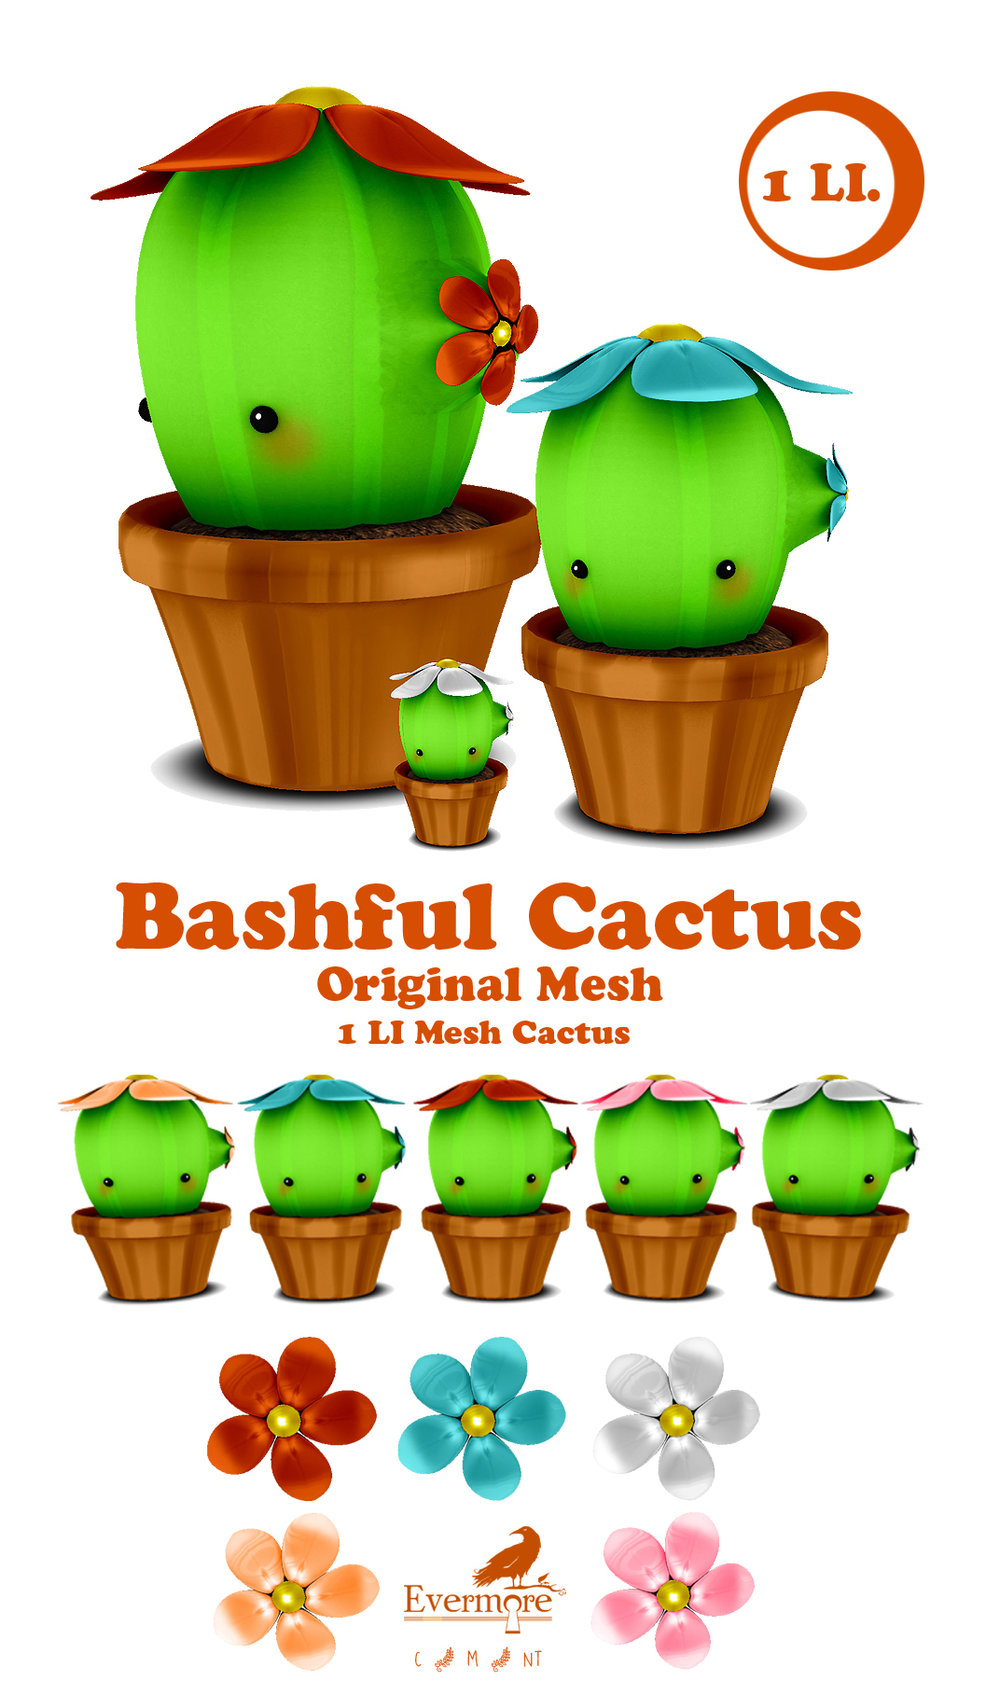 Evermore. Bashful Cactus AD.jpg